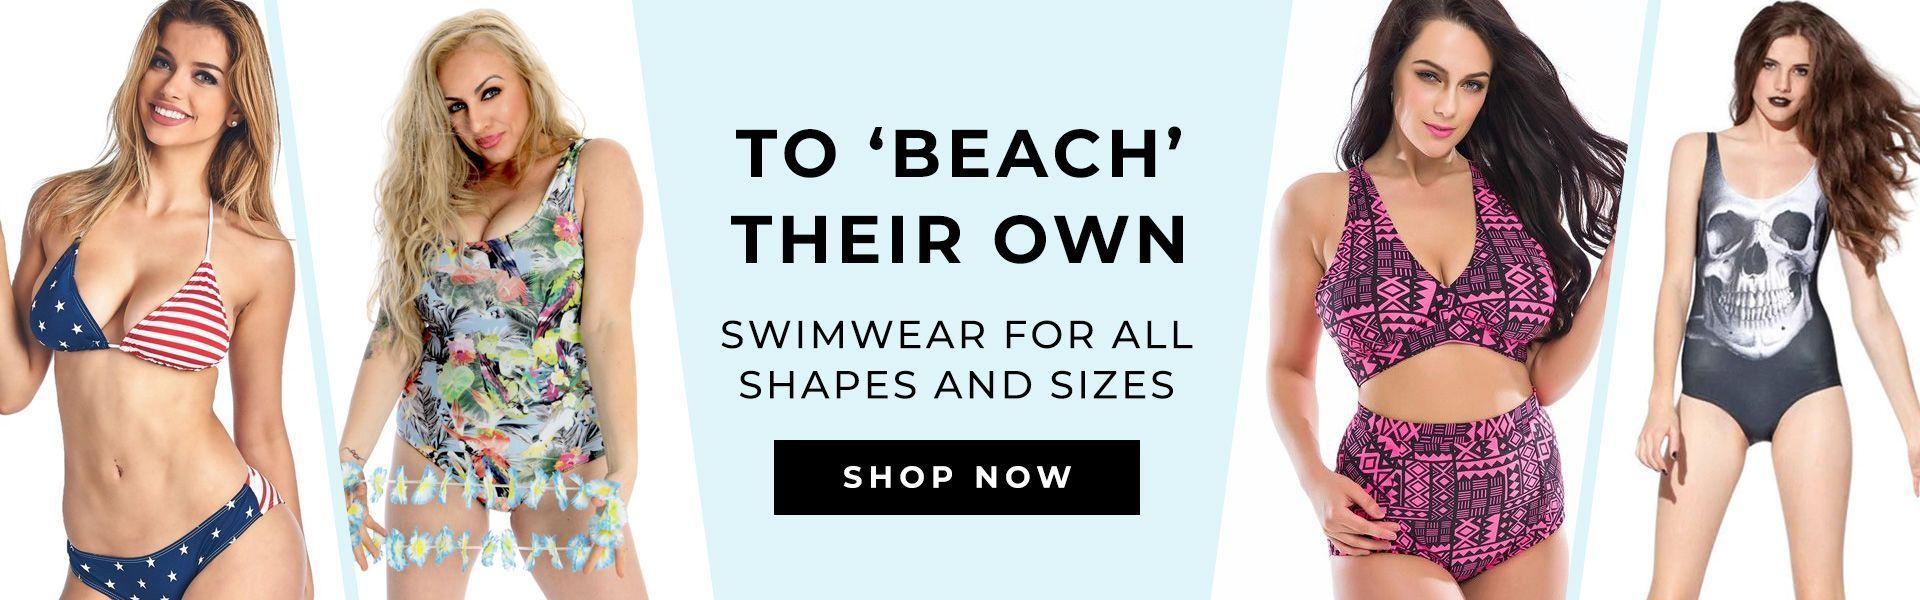 April swimwear homepage banner